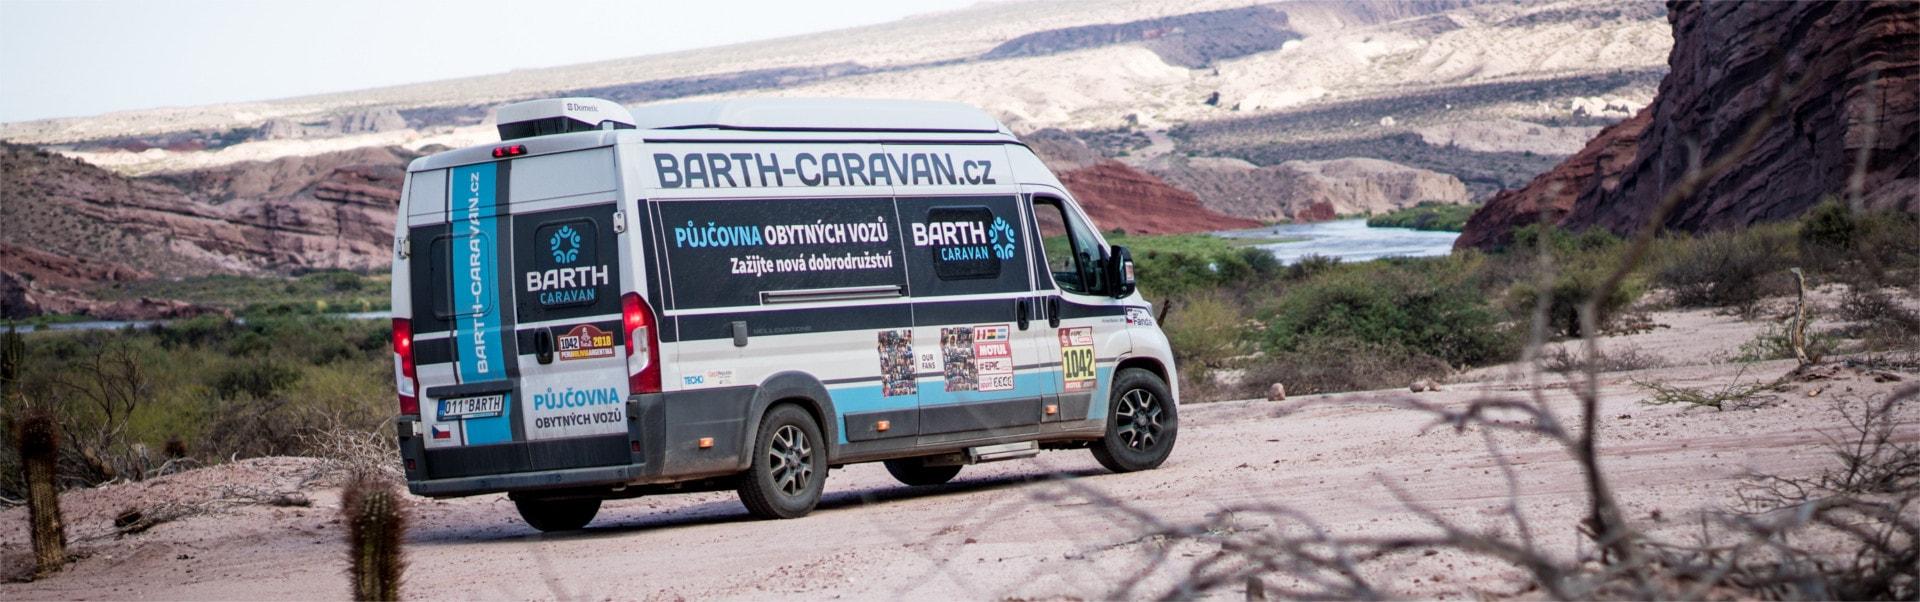 Obytný vůz na Rallye Dakar